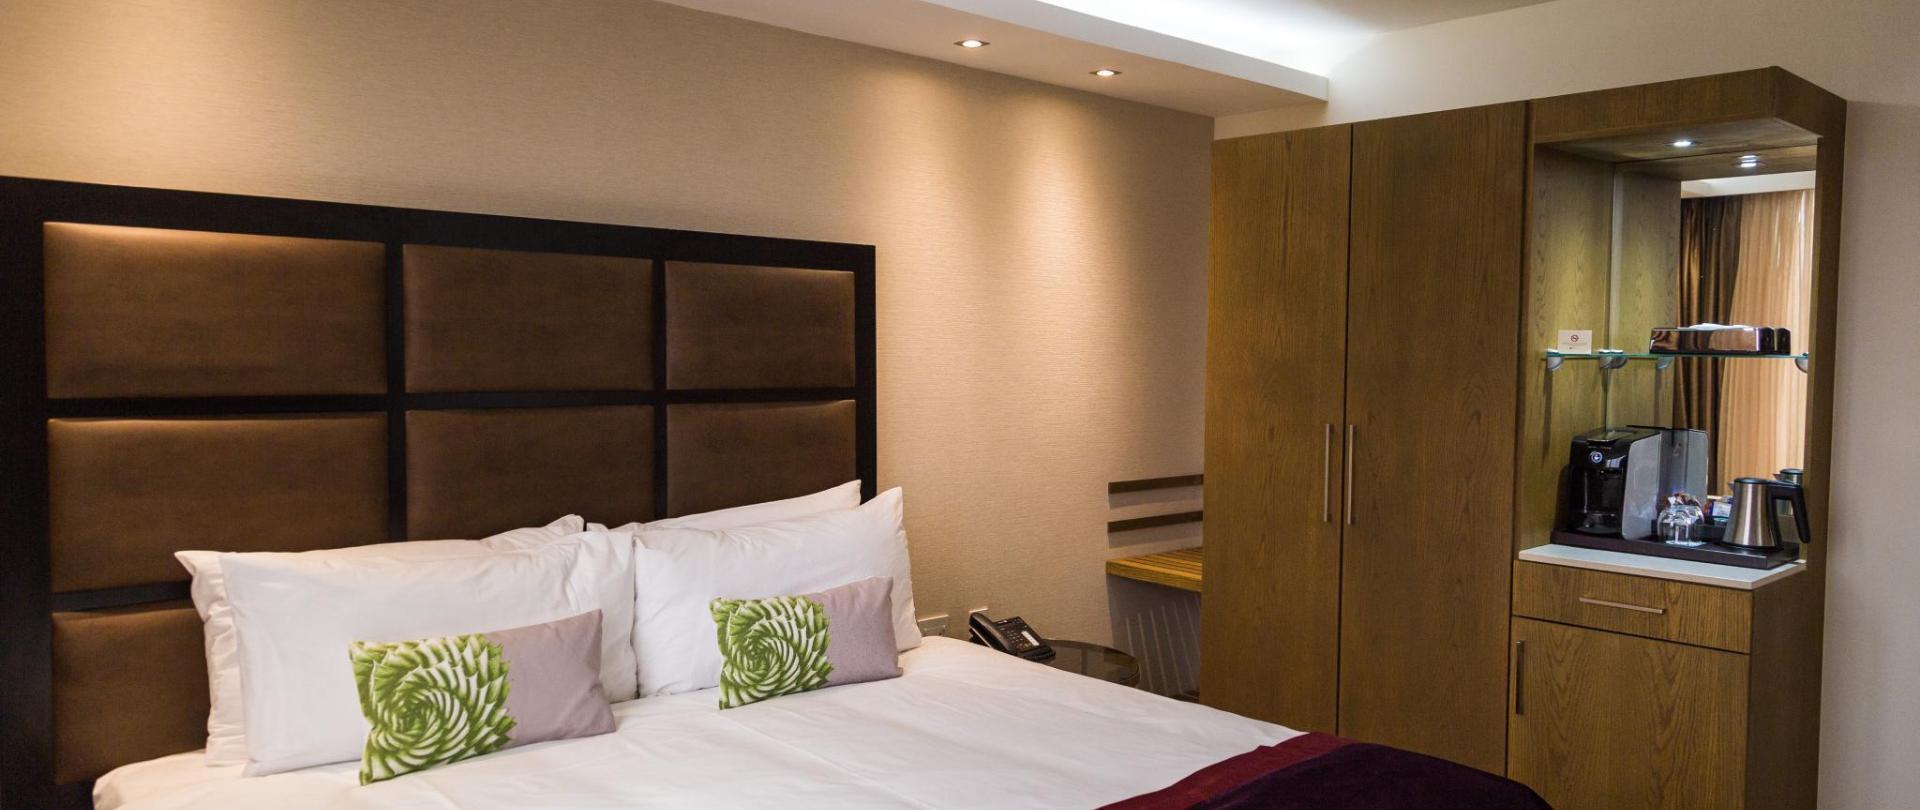 room-68.jpg